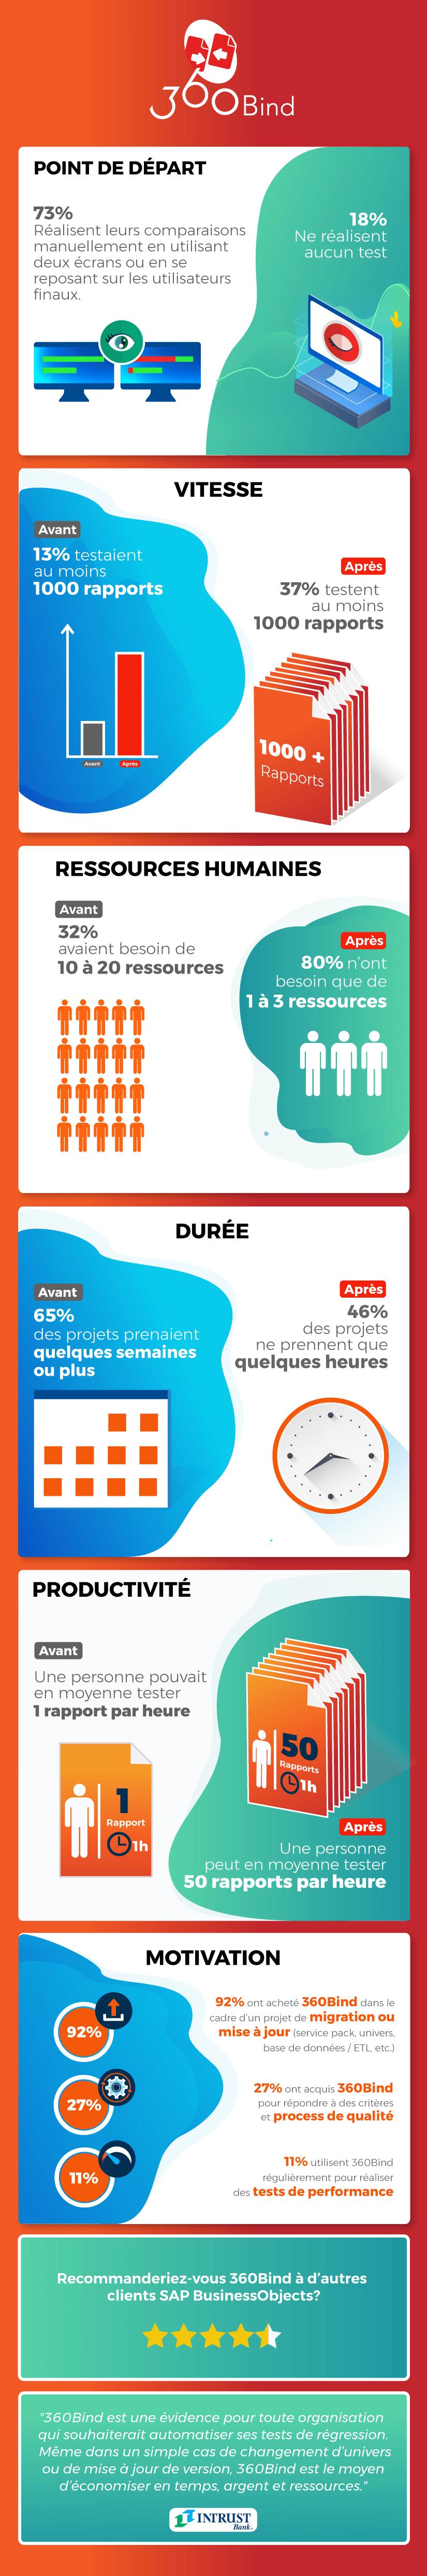 infographie-enquete-360Bind